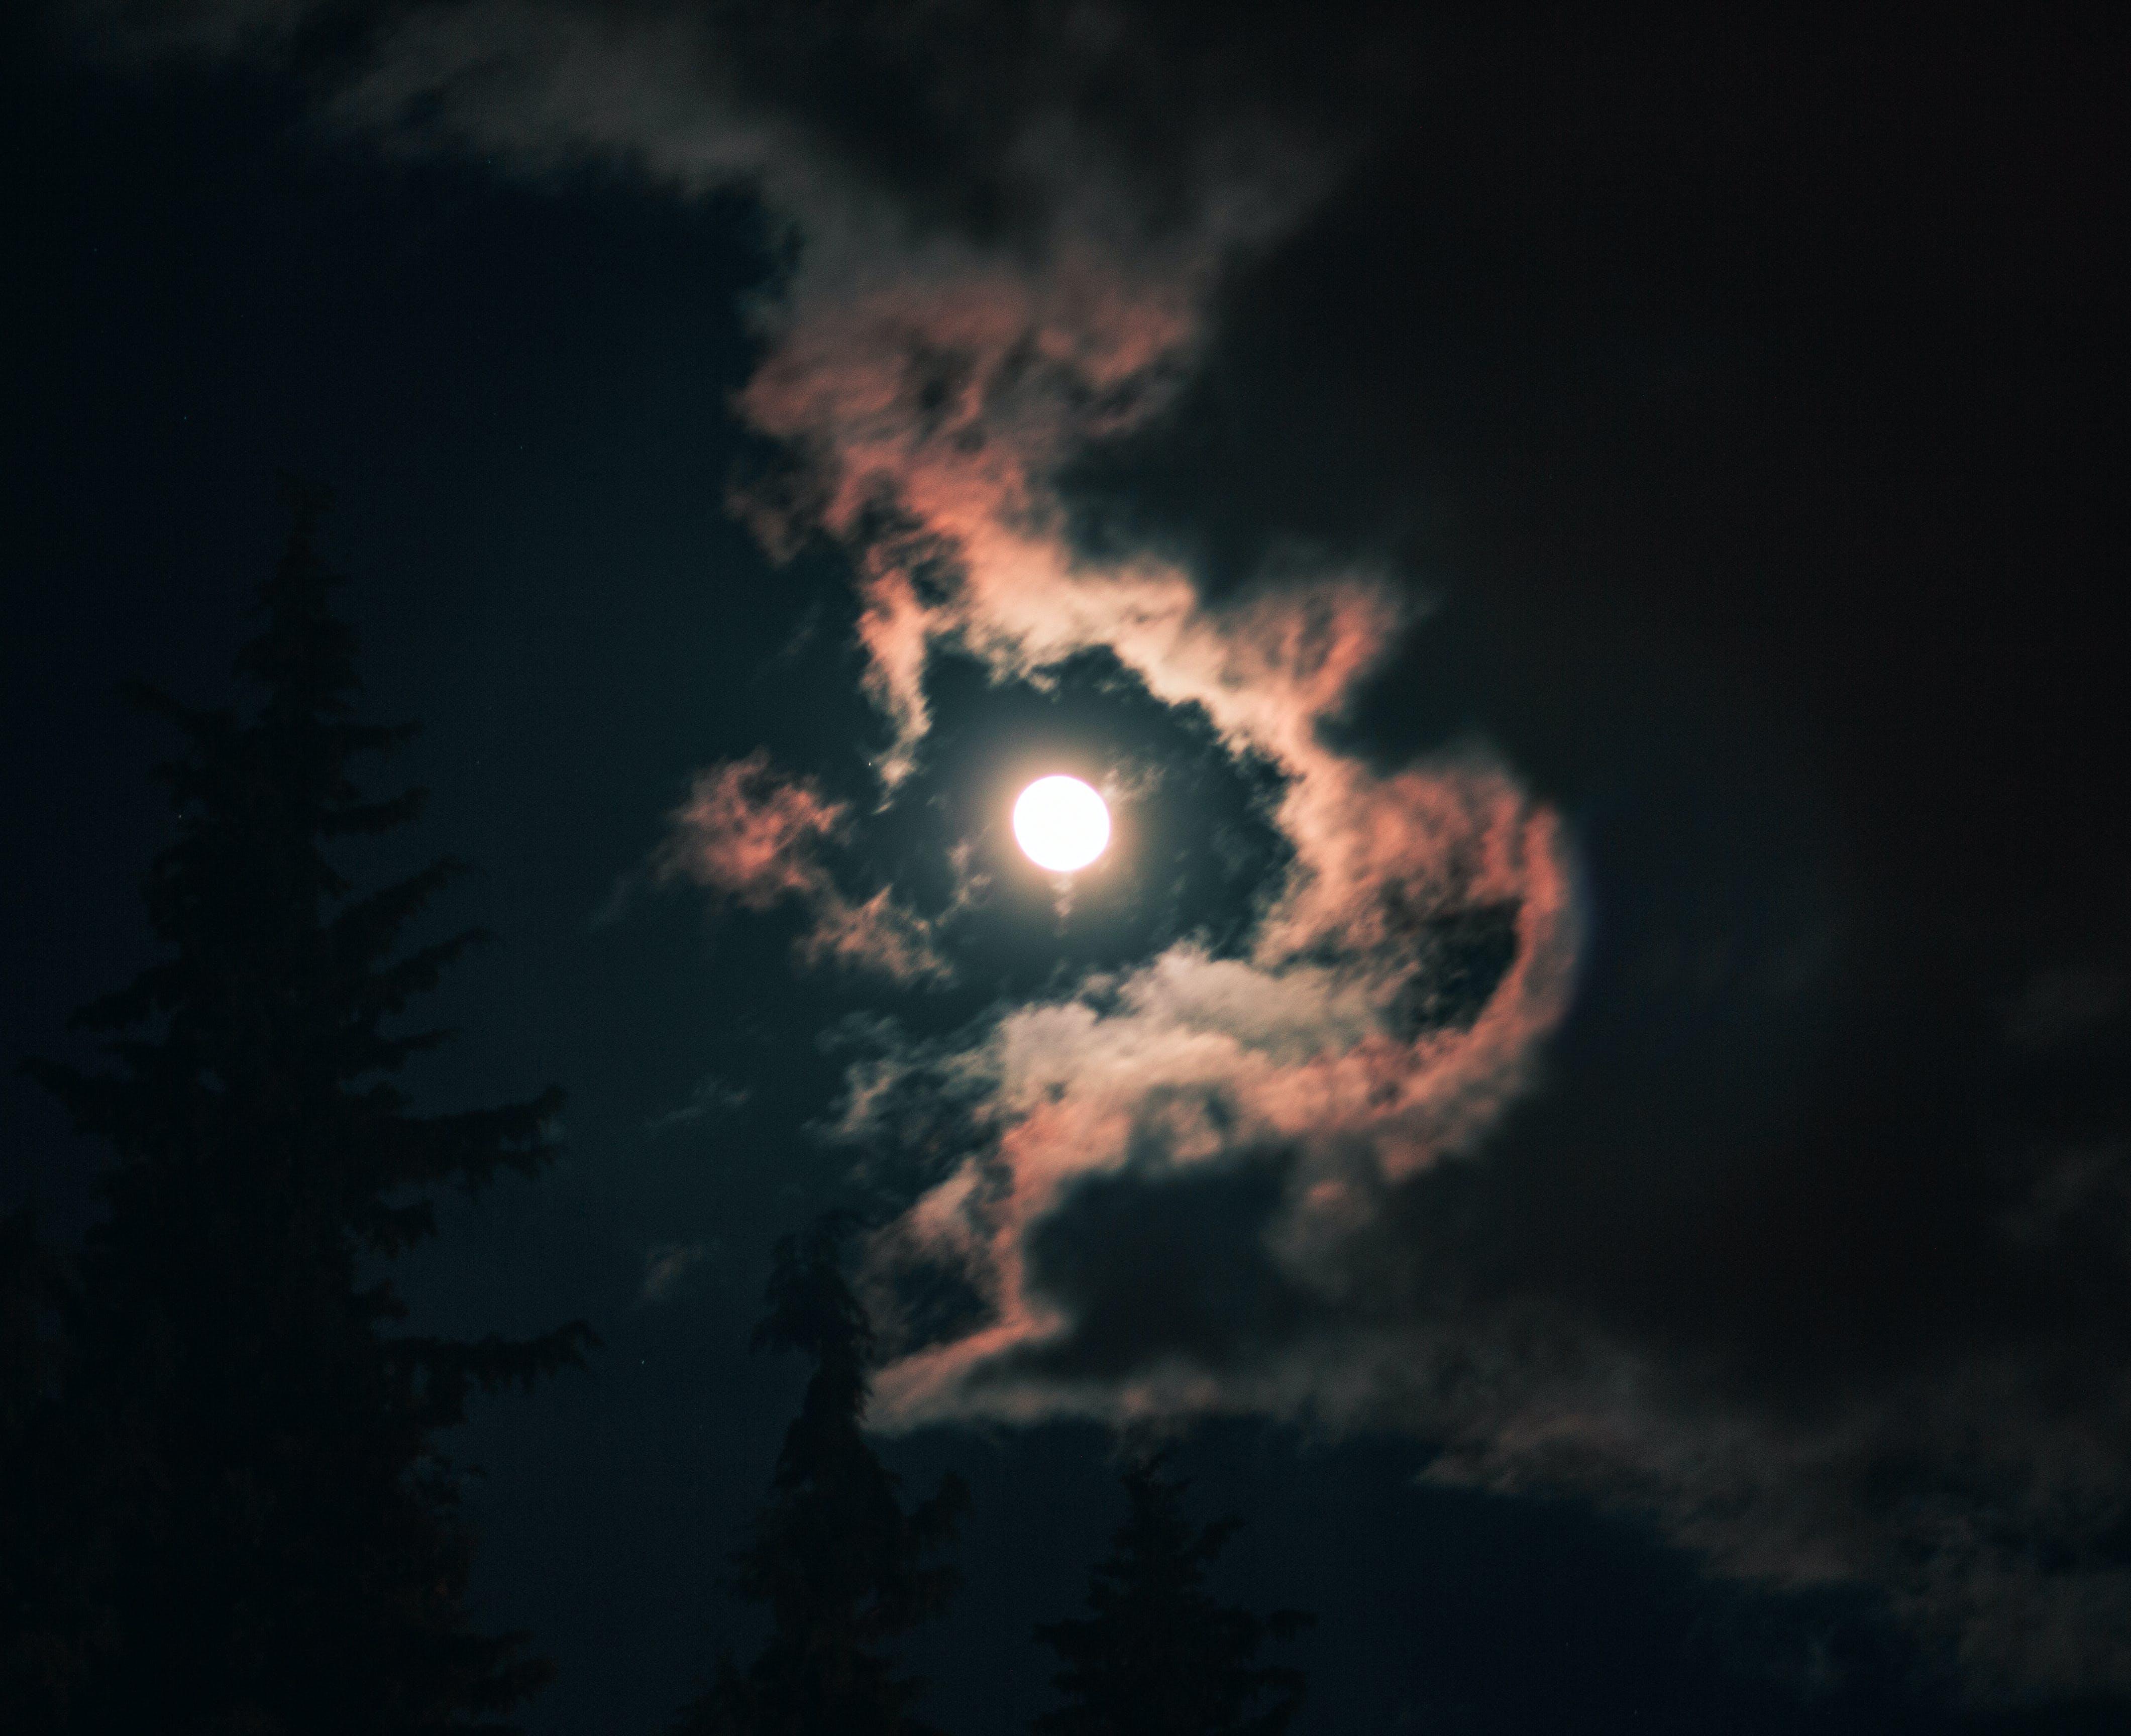 forest, full moon, honeymoon